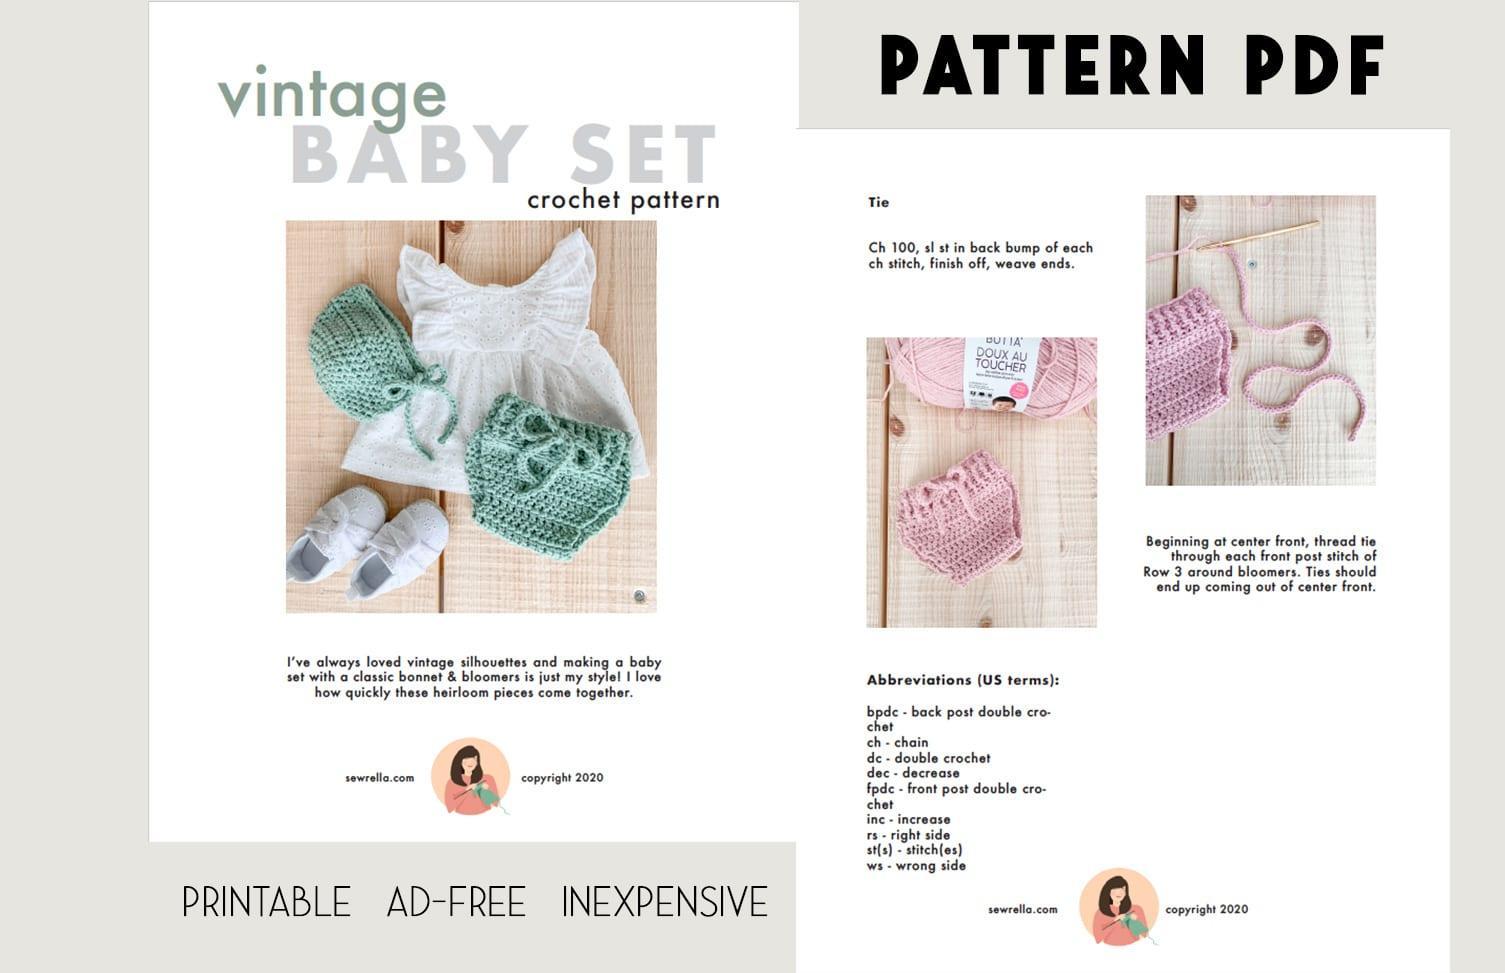 pattern PDF ad vintage baby set crochet pattern